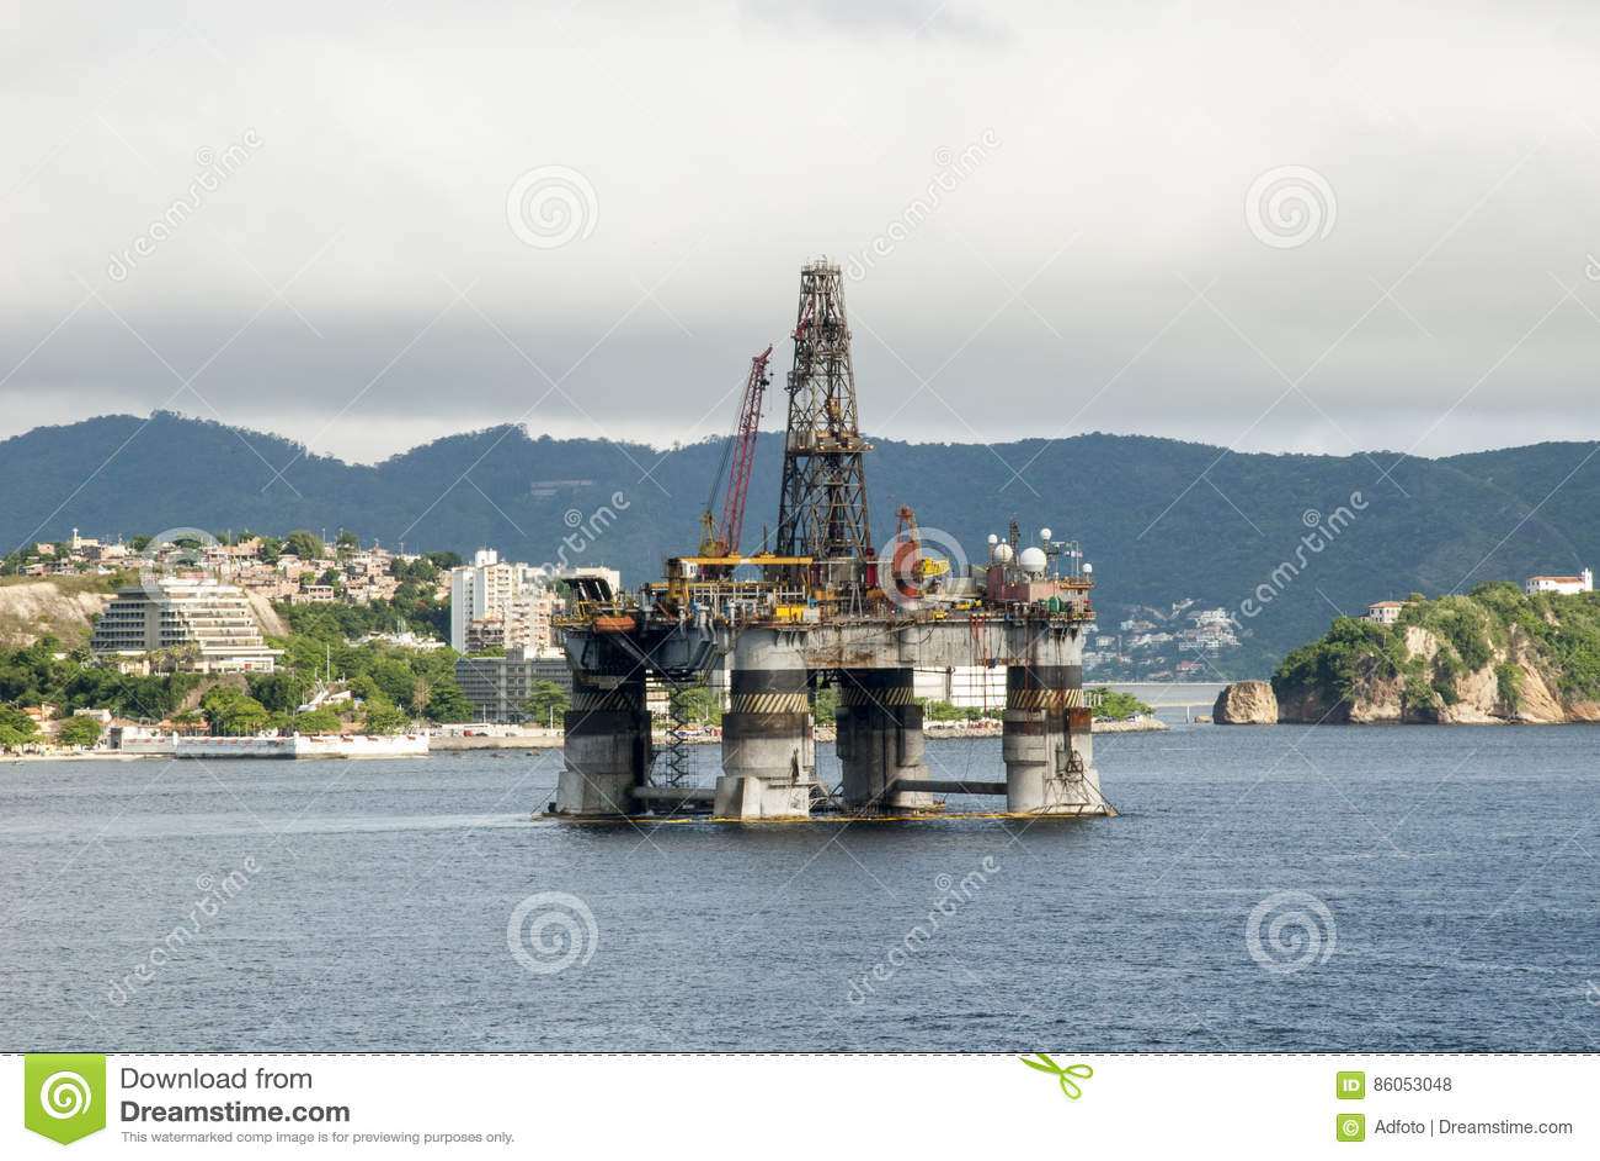 Brasilien - olje- Rig In Guanabara Bay - Rio de Janeiro